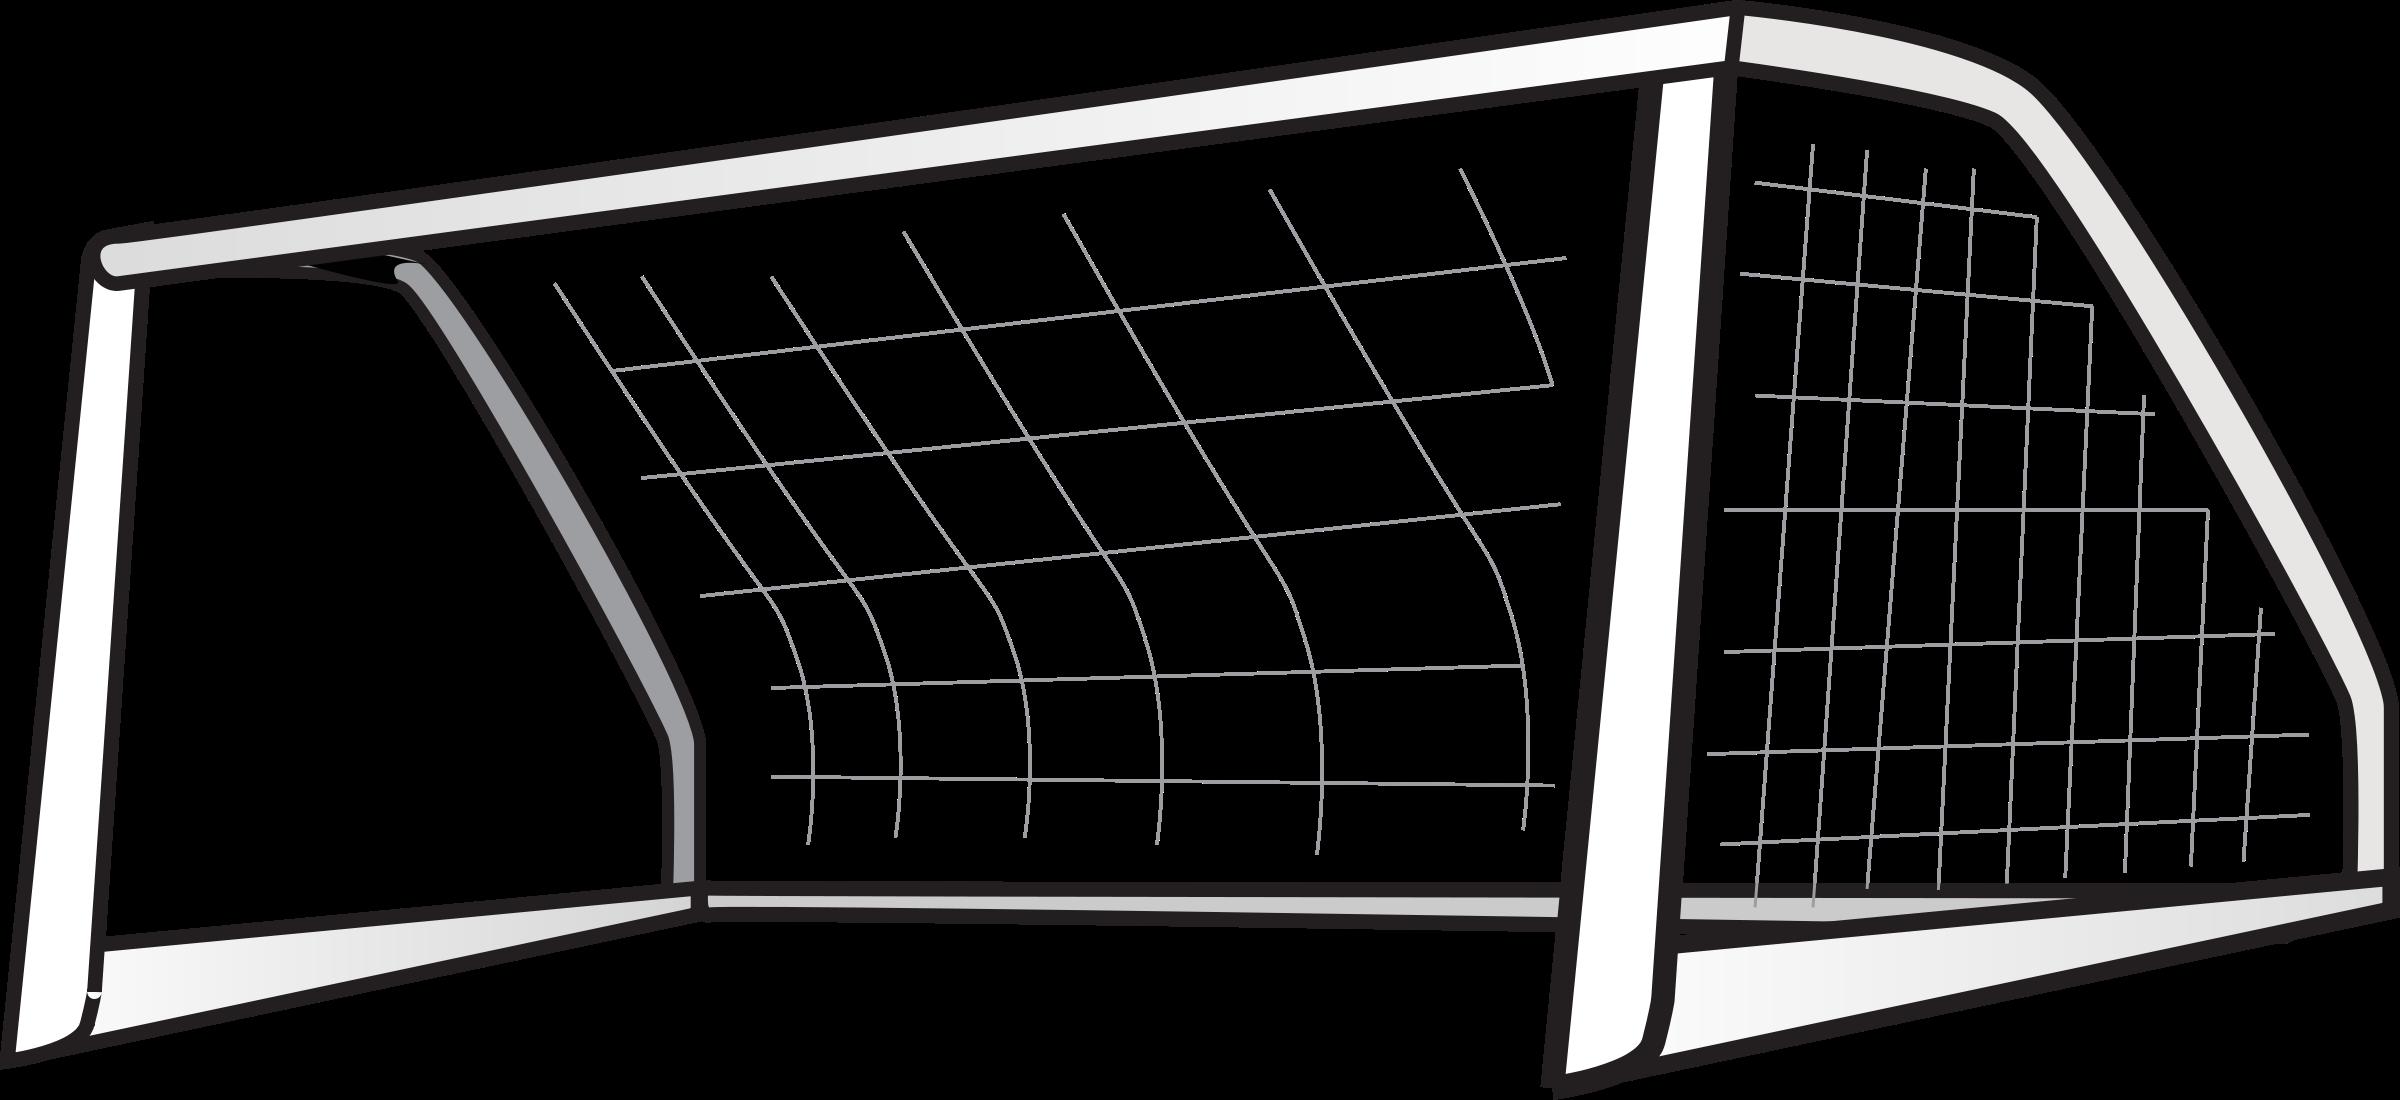 Football Outline Image Free Download Best Football Outline Image